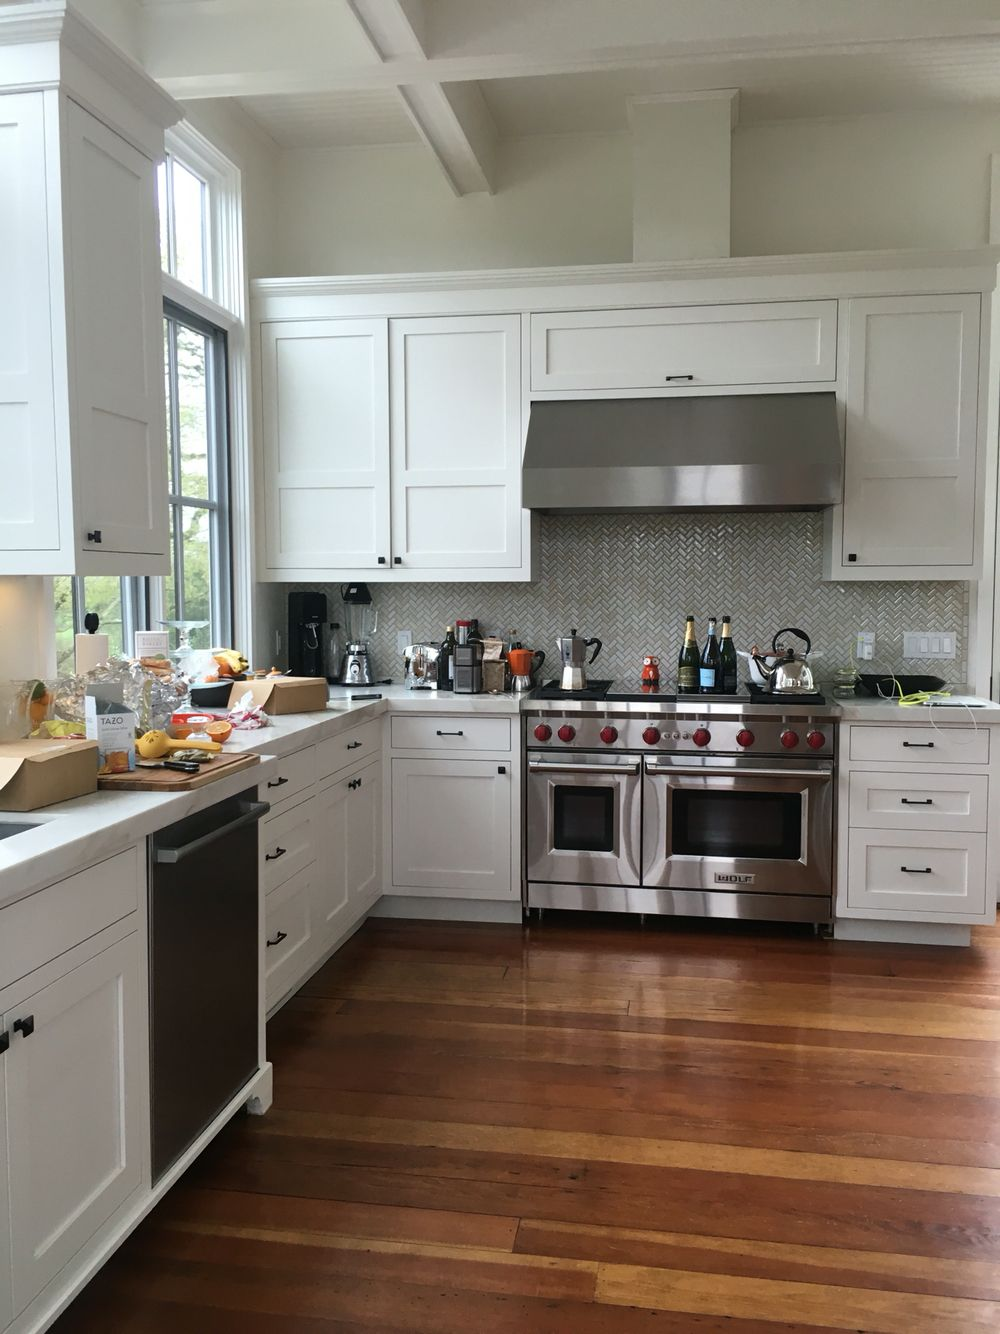 Ideal kitchen layout, backsplash, cabinets -- bright and ...